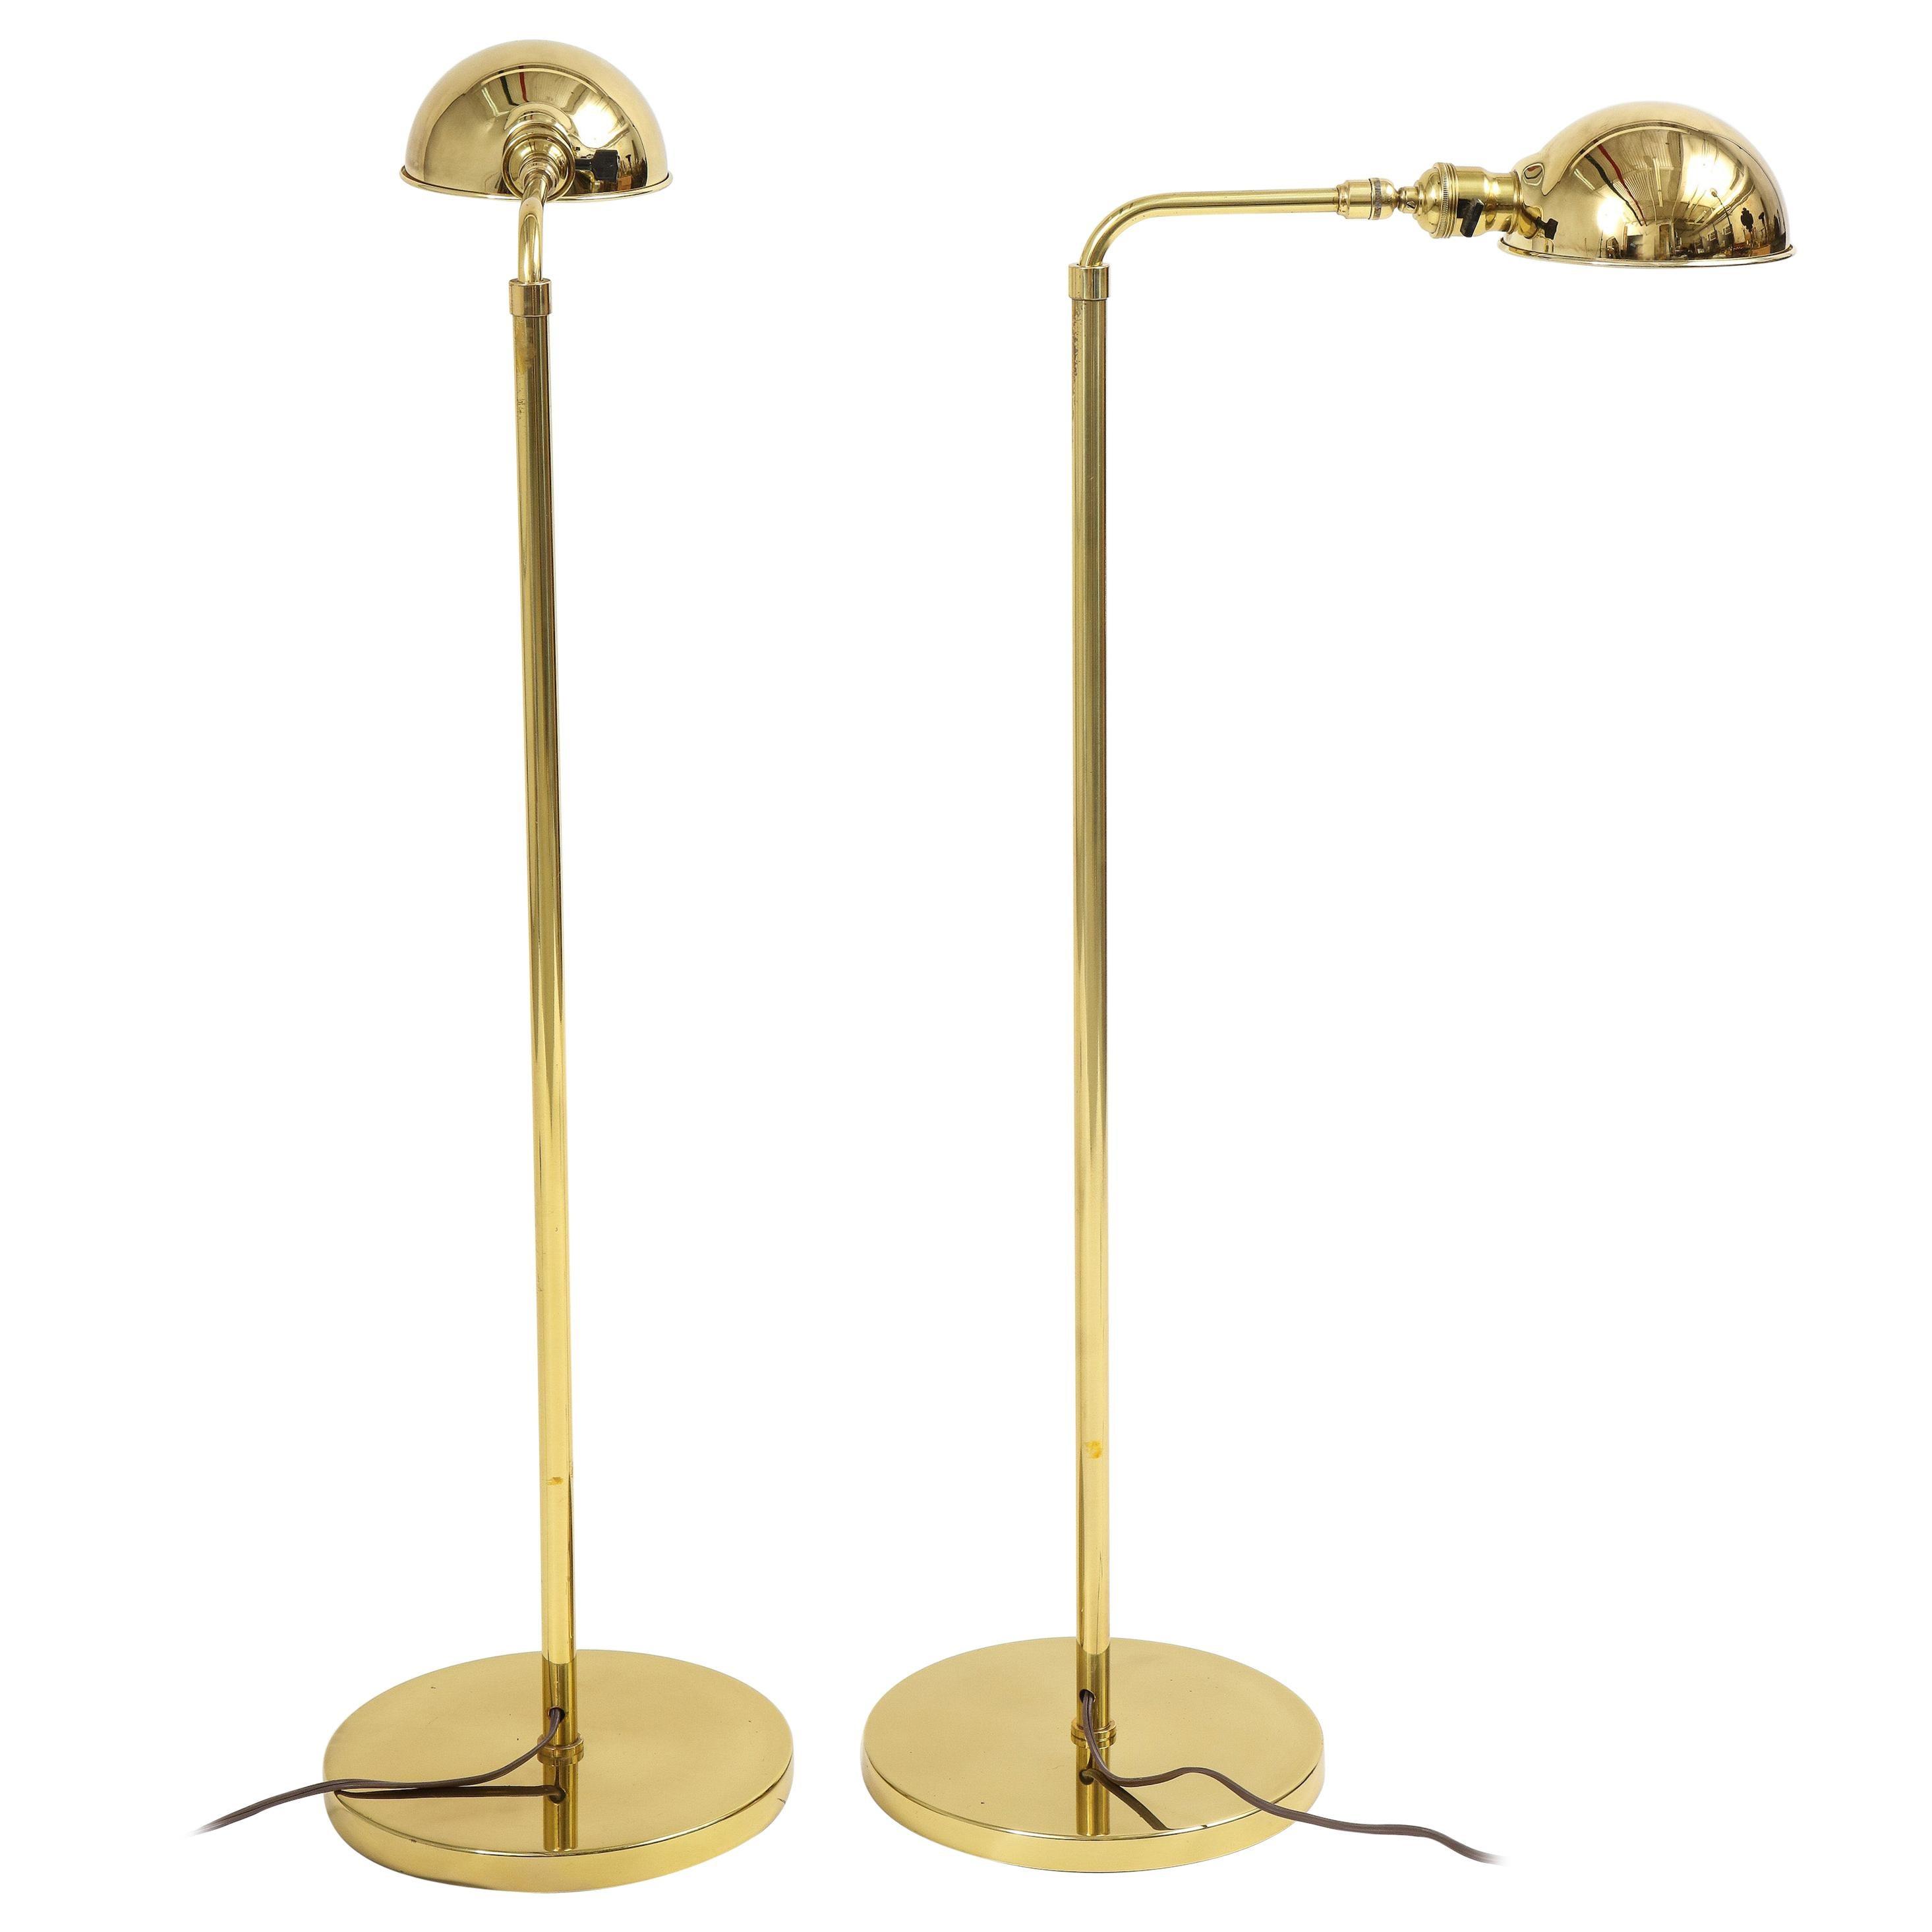 Pair of Vintage Hansen Brass Pharmacy Floor Lamps